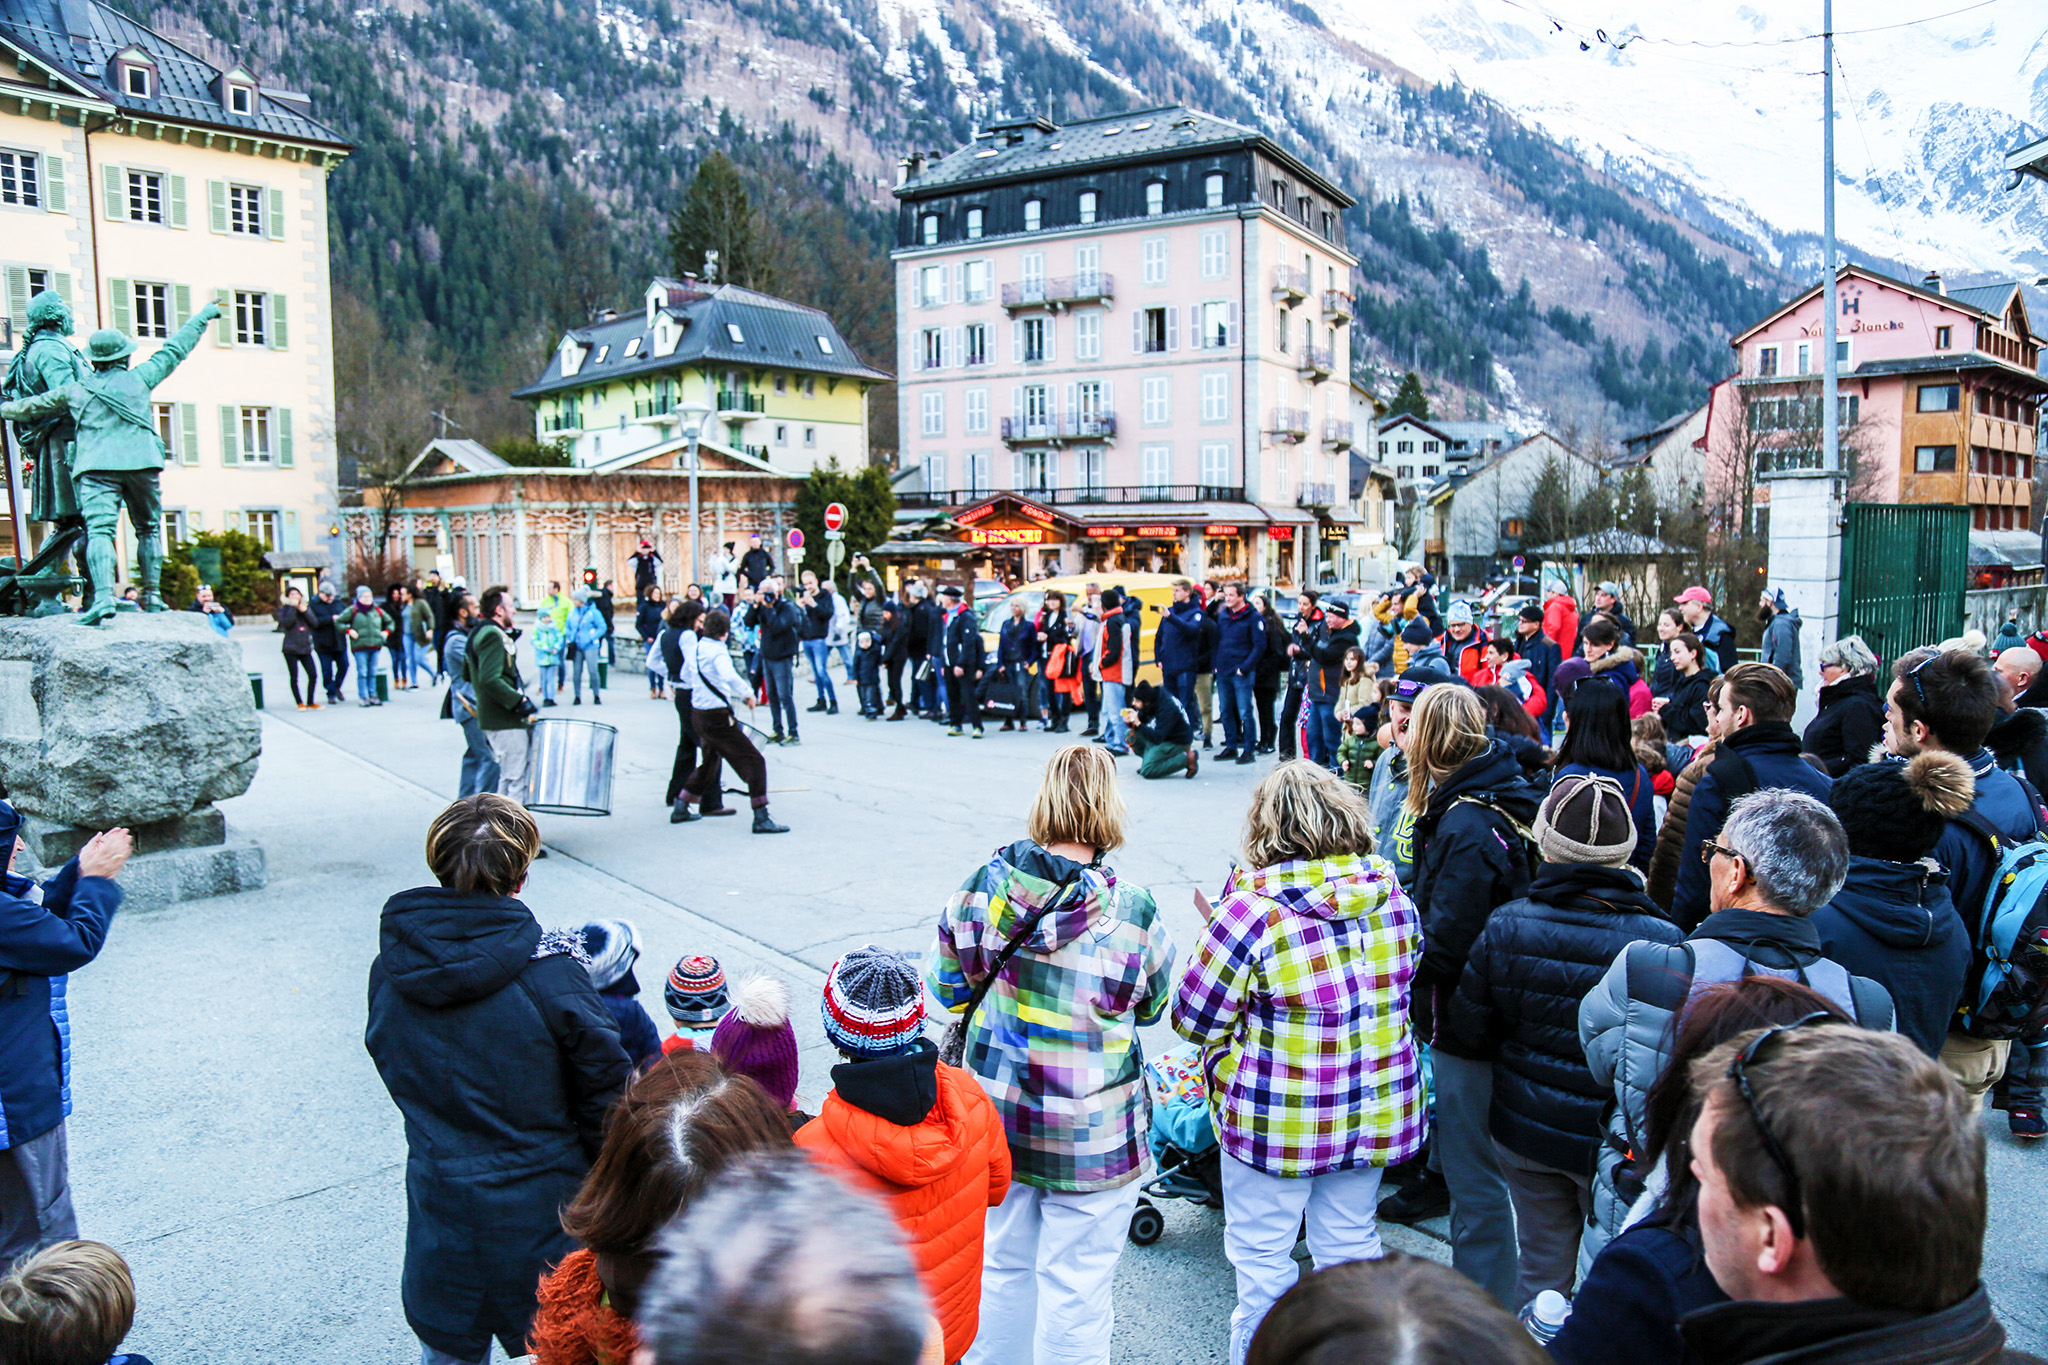 kt_2020_100_keytours_excursions_swisstours_chamonix_mont-blanc_village8_2048_10